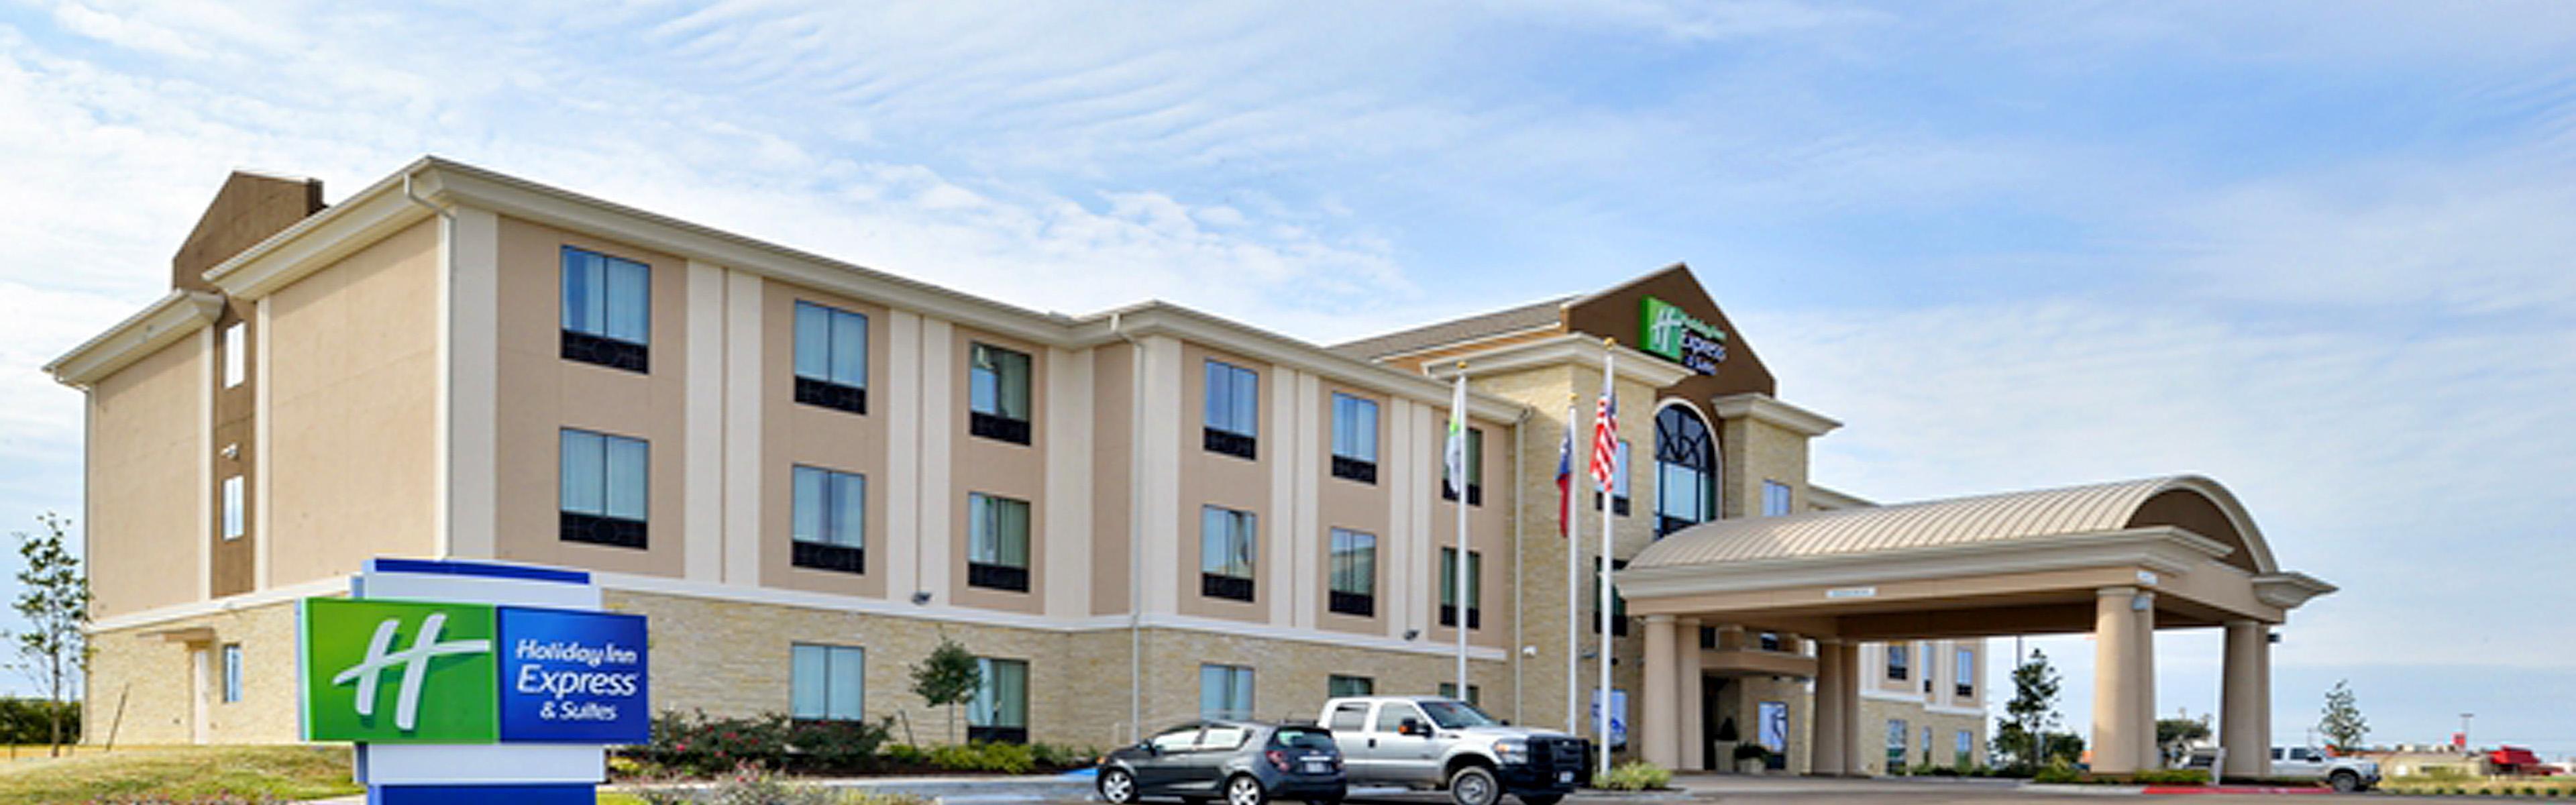 Holiday Inn Express & Suites Schulenburg image 0